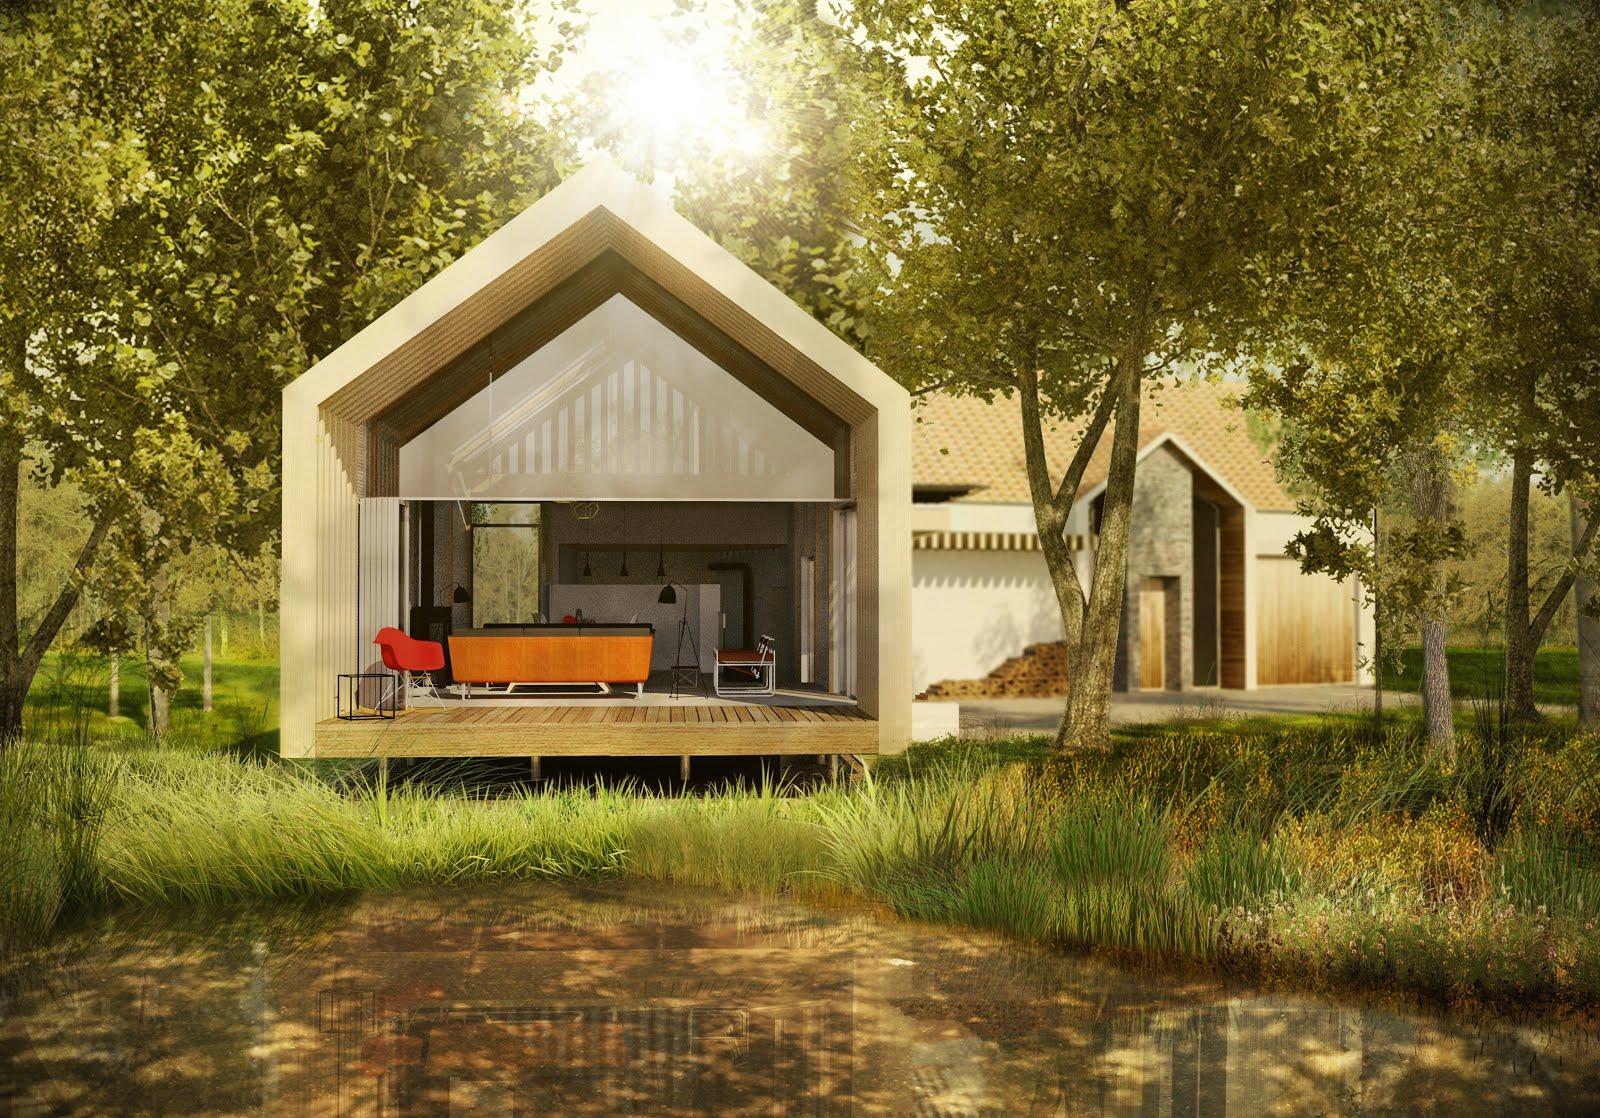 Oak framed house gets planning permission peregrine mears architects planning permission for a new off grid home in dorset baanklon Gallery